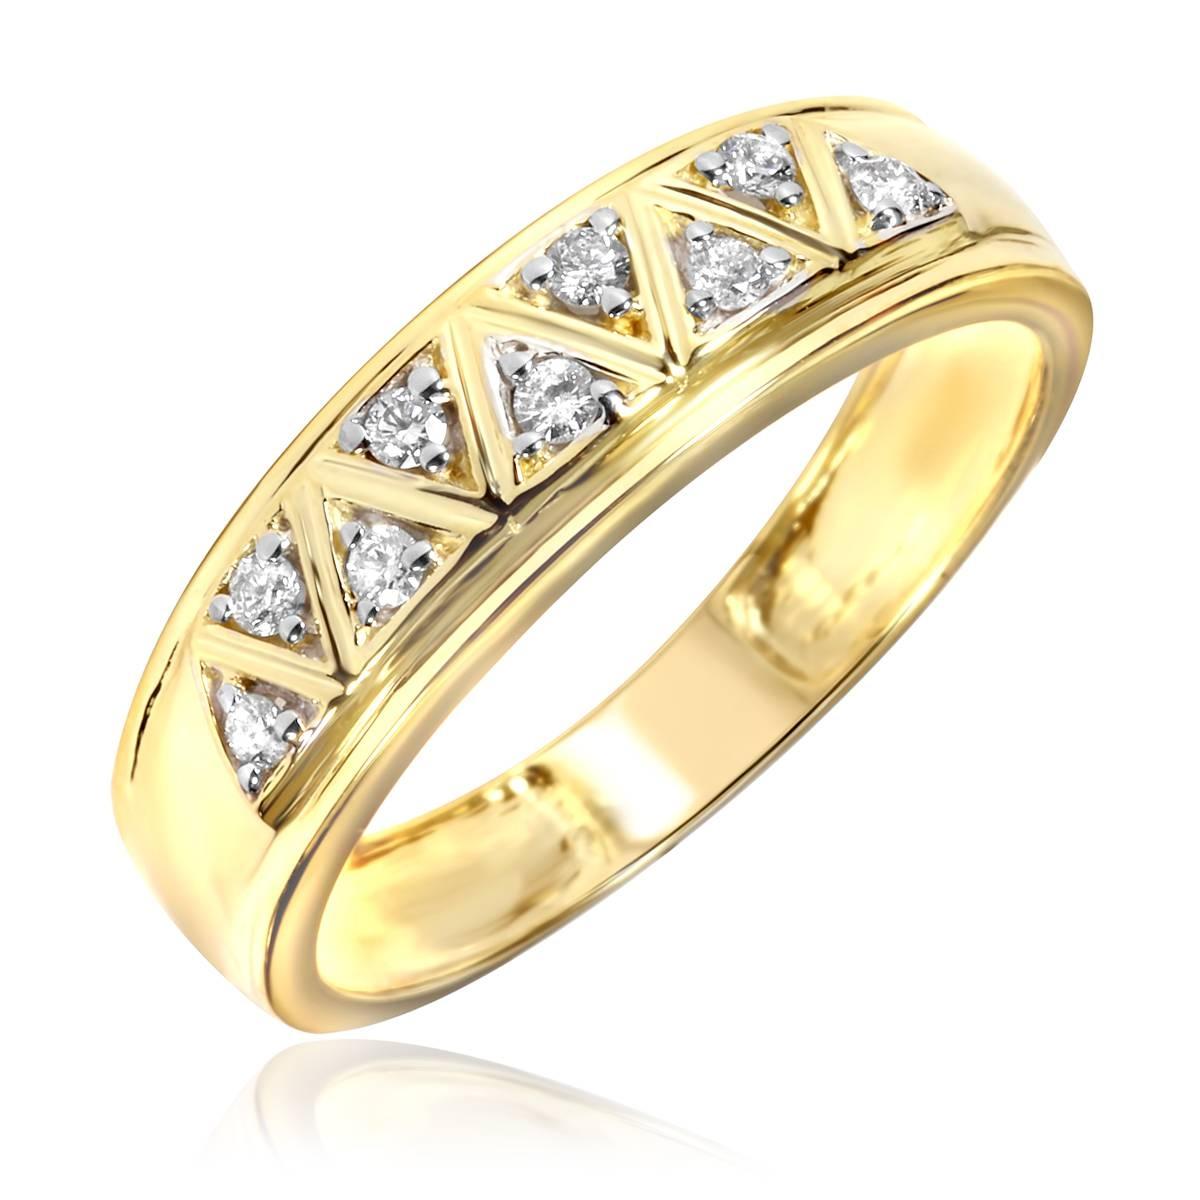 1/5 Carat T.w. Diamond Men's Wedding Ring 10K Yellow Gold In Gold Wedding Bands For Men (Gallery 1 of 15)